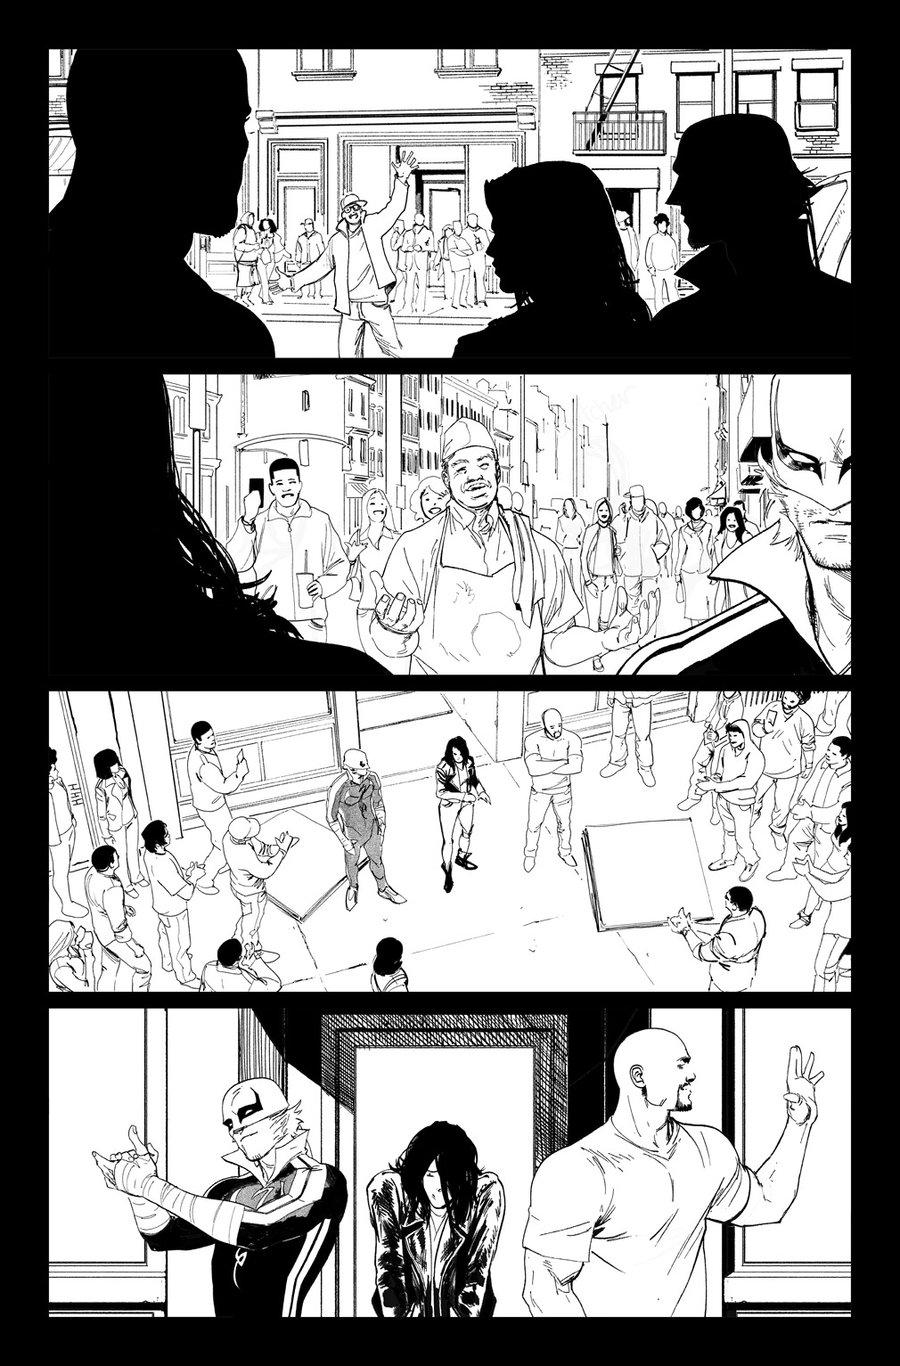 Image of DEFENDERS #10, p.09 ARTIST'S PROOF